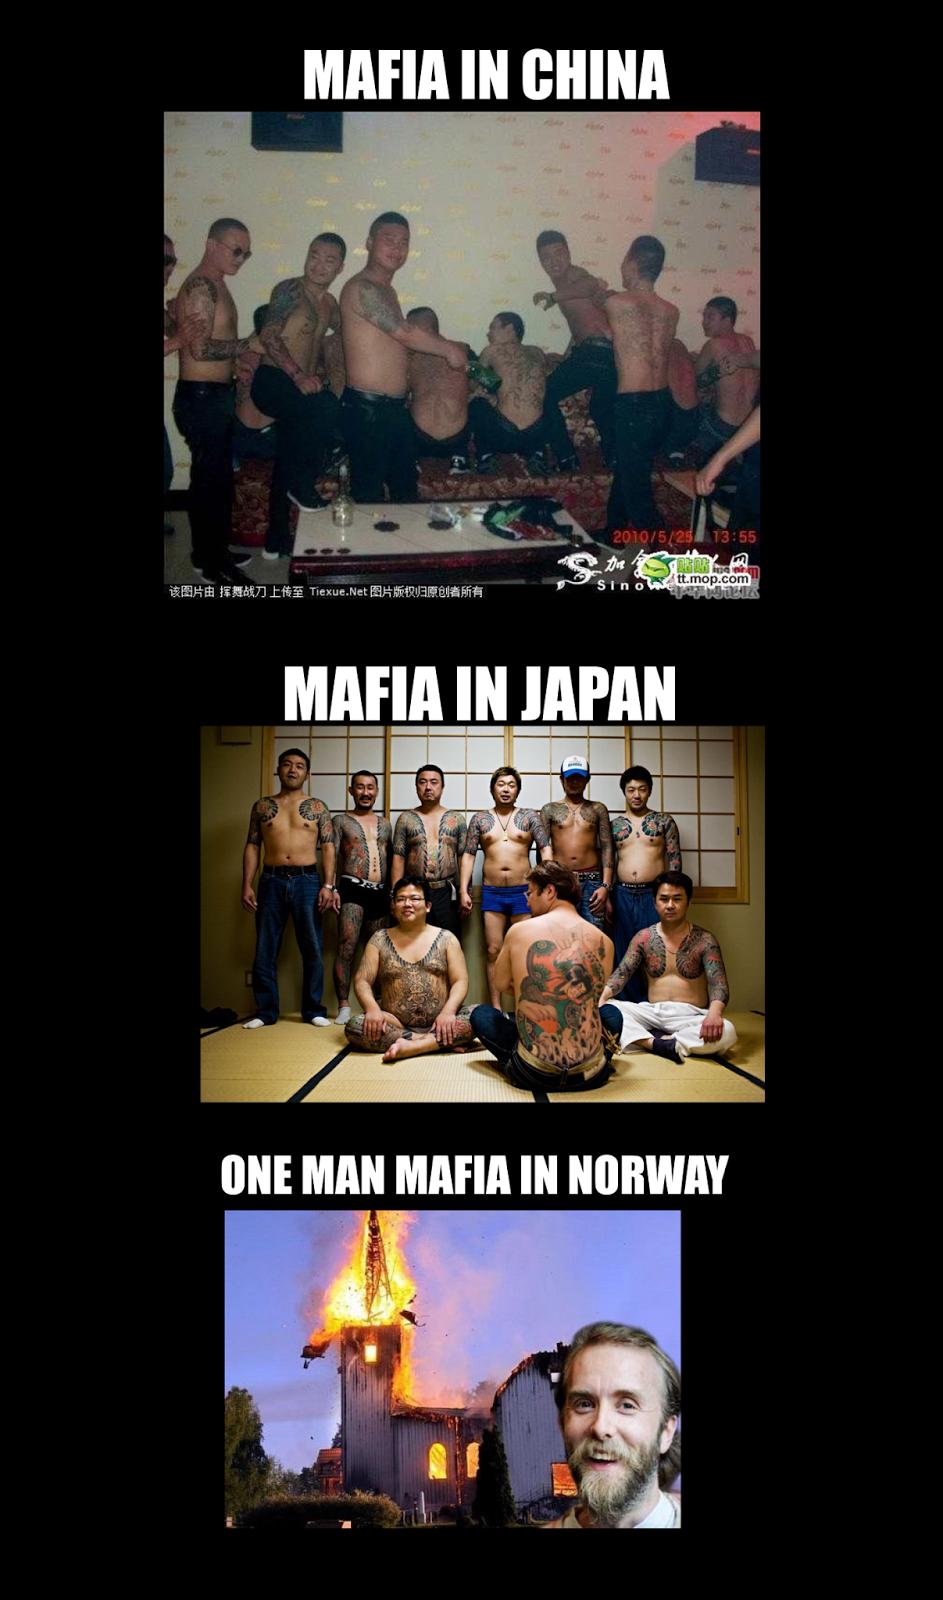 Varg Vikernes Meme, Varg Vikernes Funny, Varg Vikernes Mafia